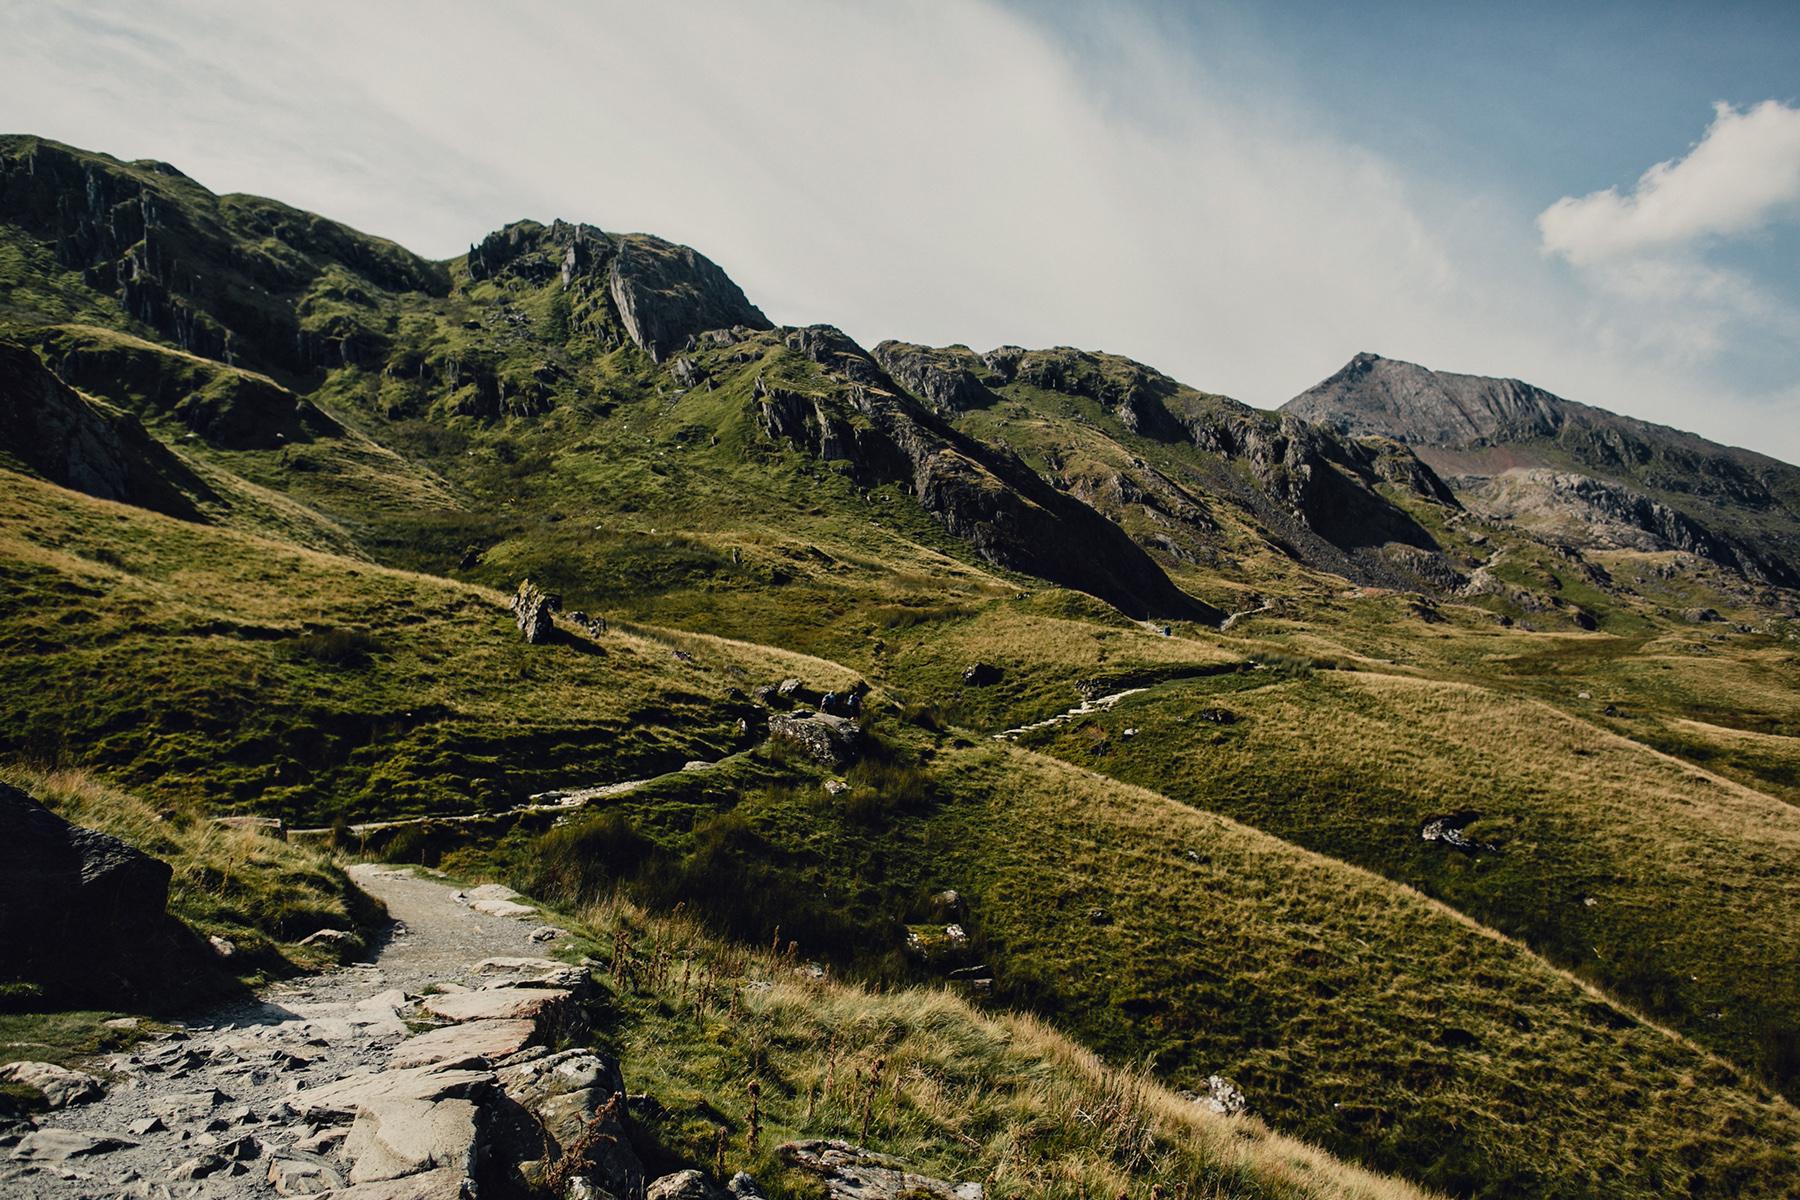 Mt-Snowdon-Hike-Photos-From-Peny-Pass-00031.jpg